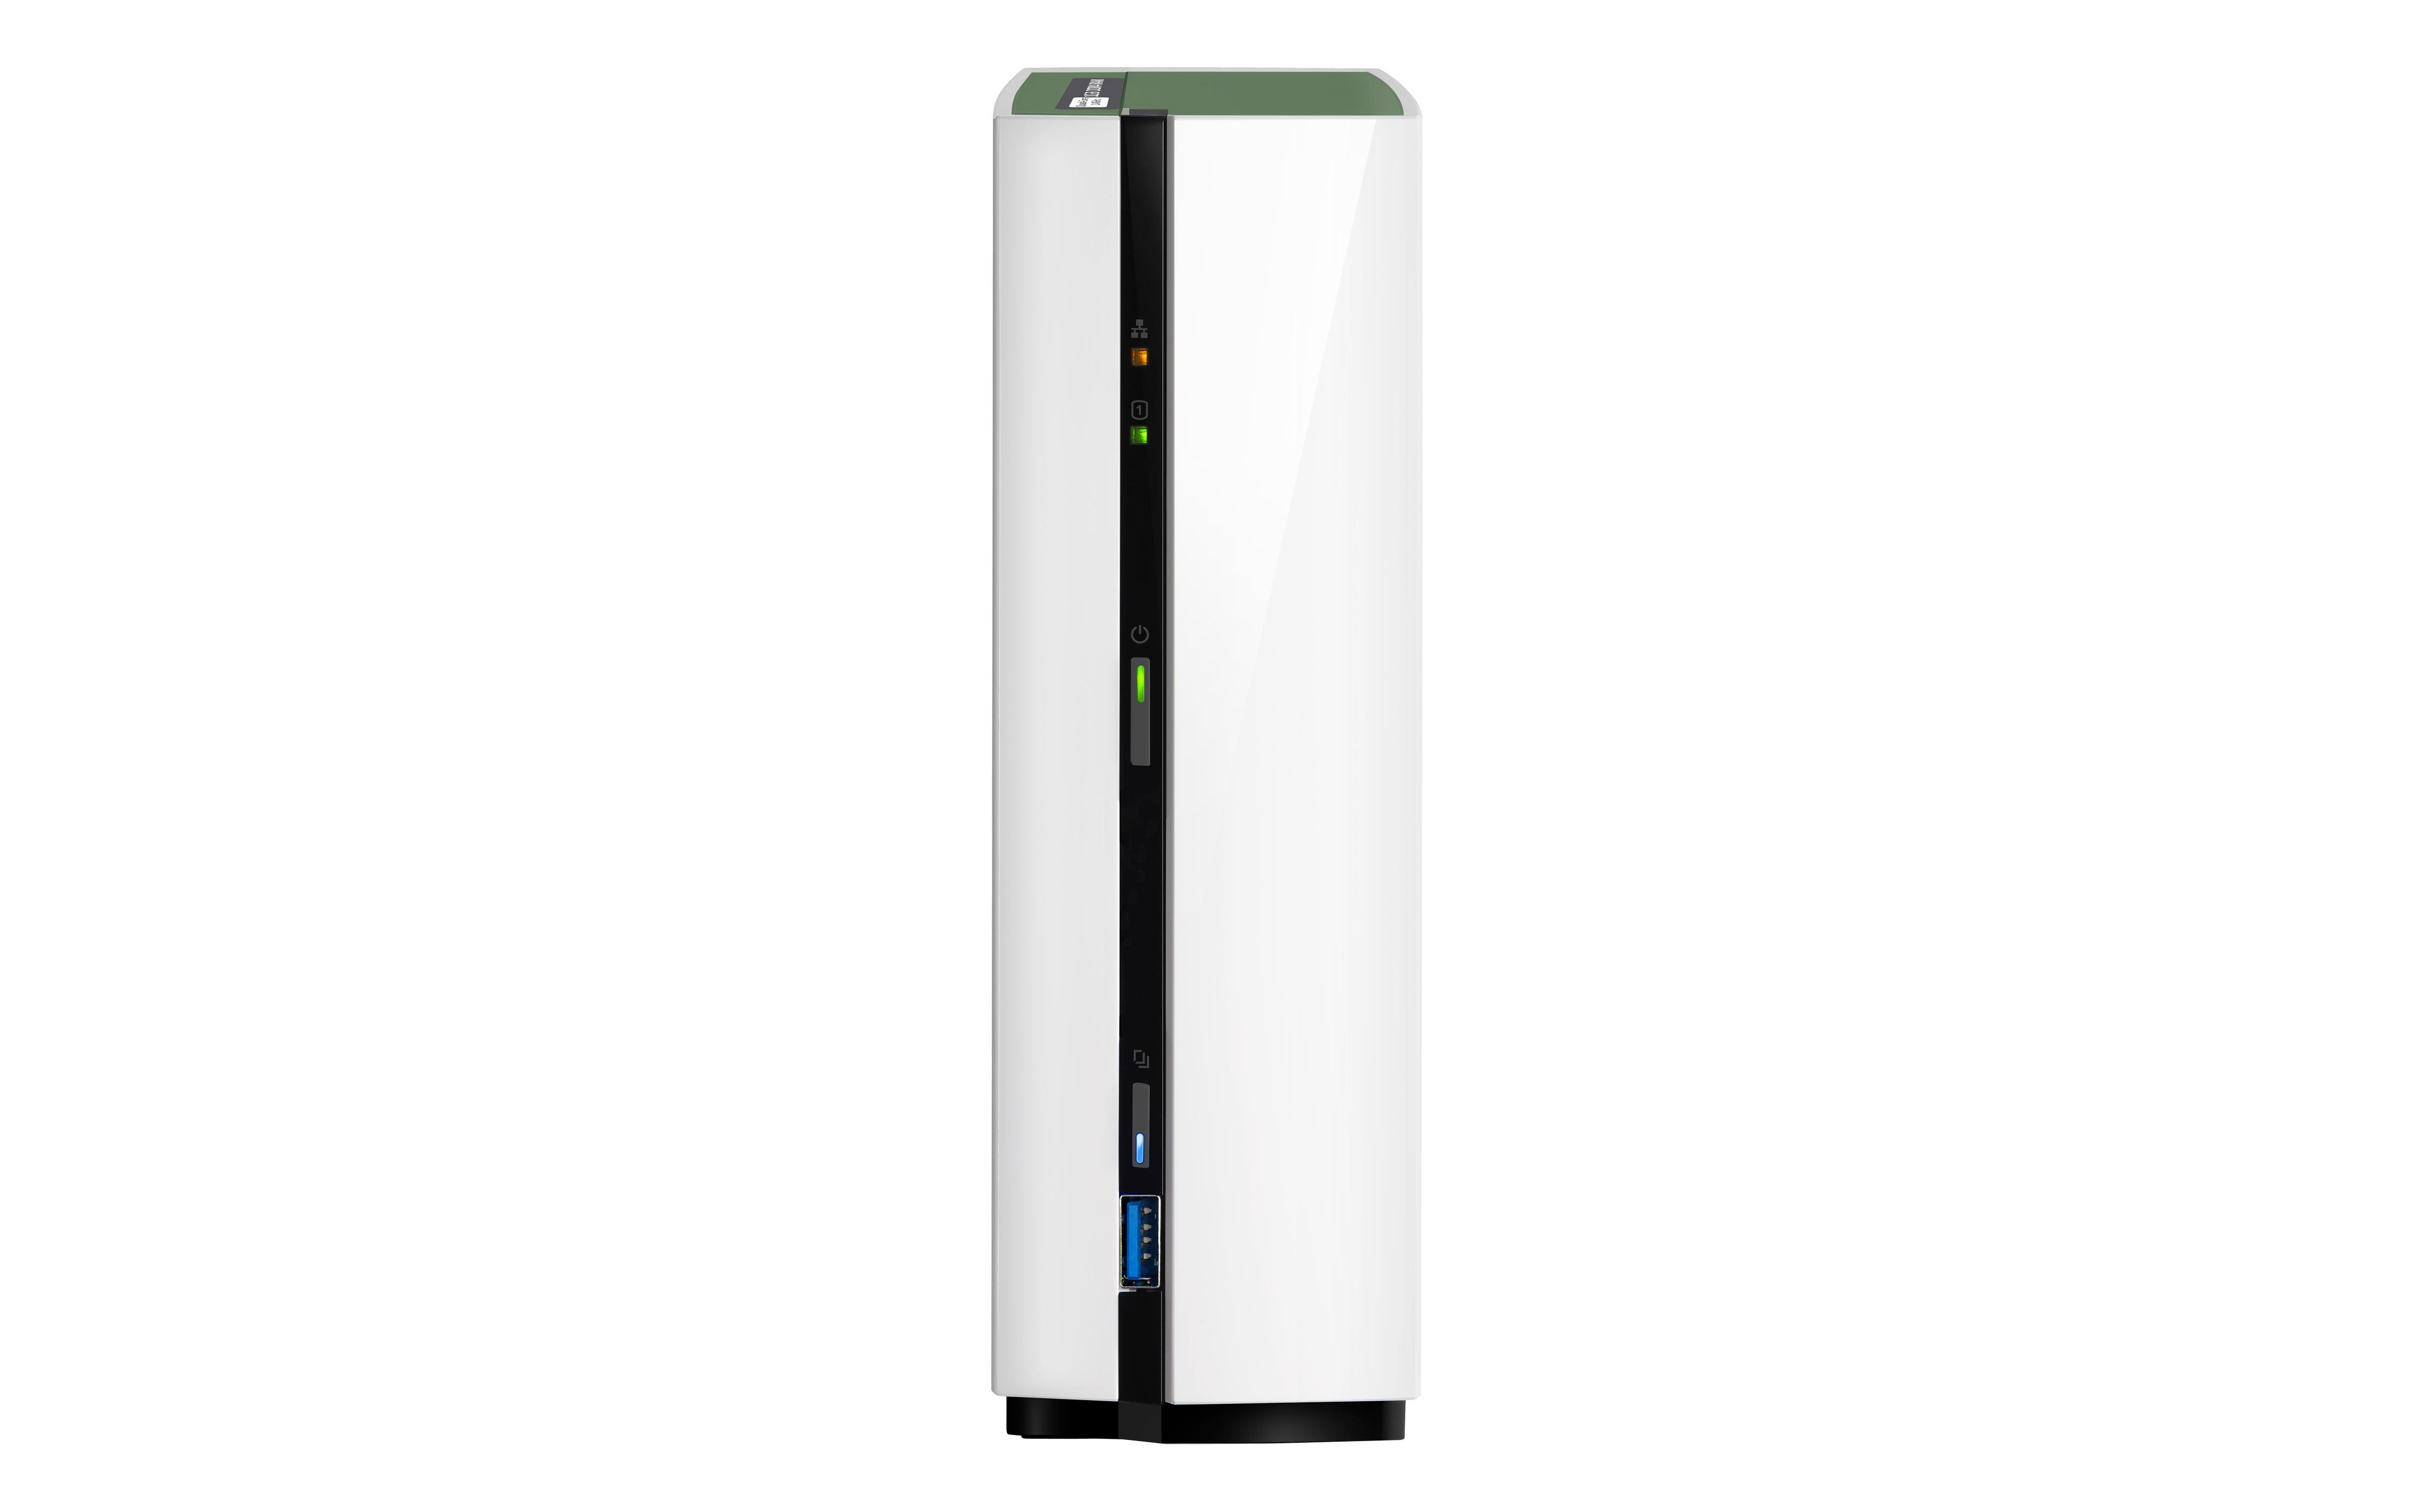 2022026-QNAP-TS-128A-Collegamento-ethernet-LAN-Mini-Tower-Bianco-NAS-K-TS-128A